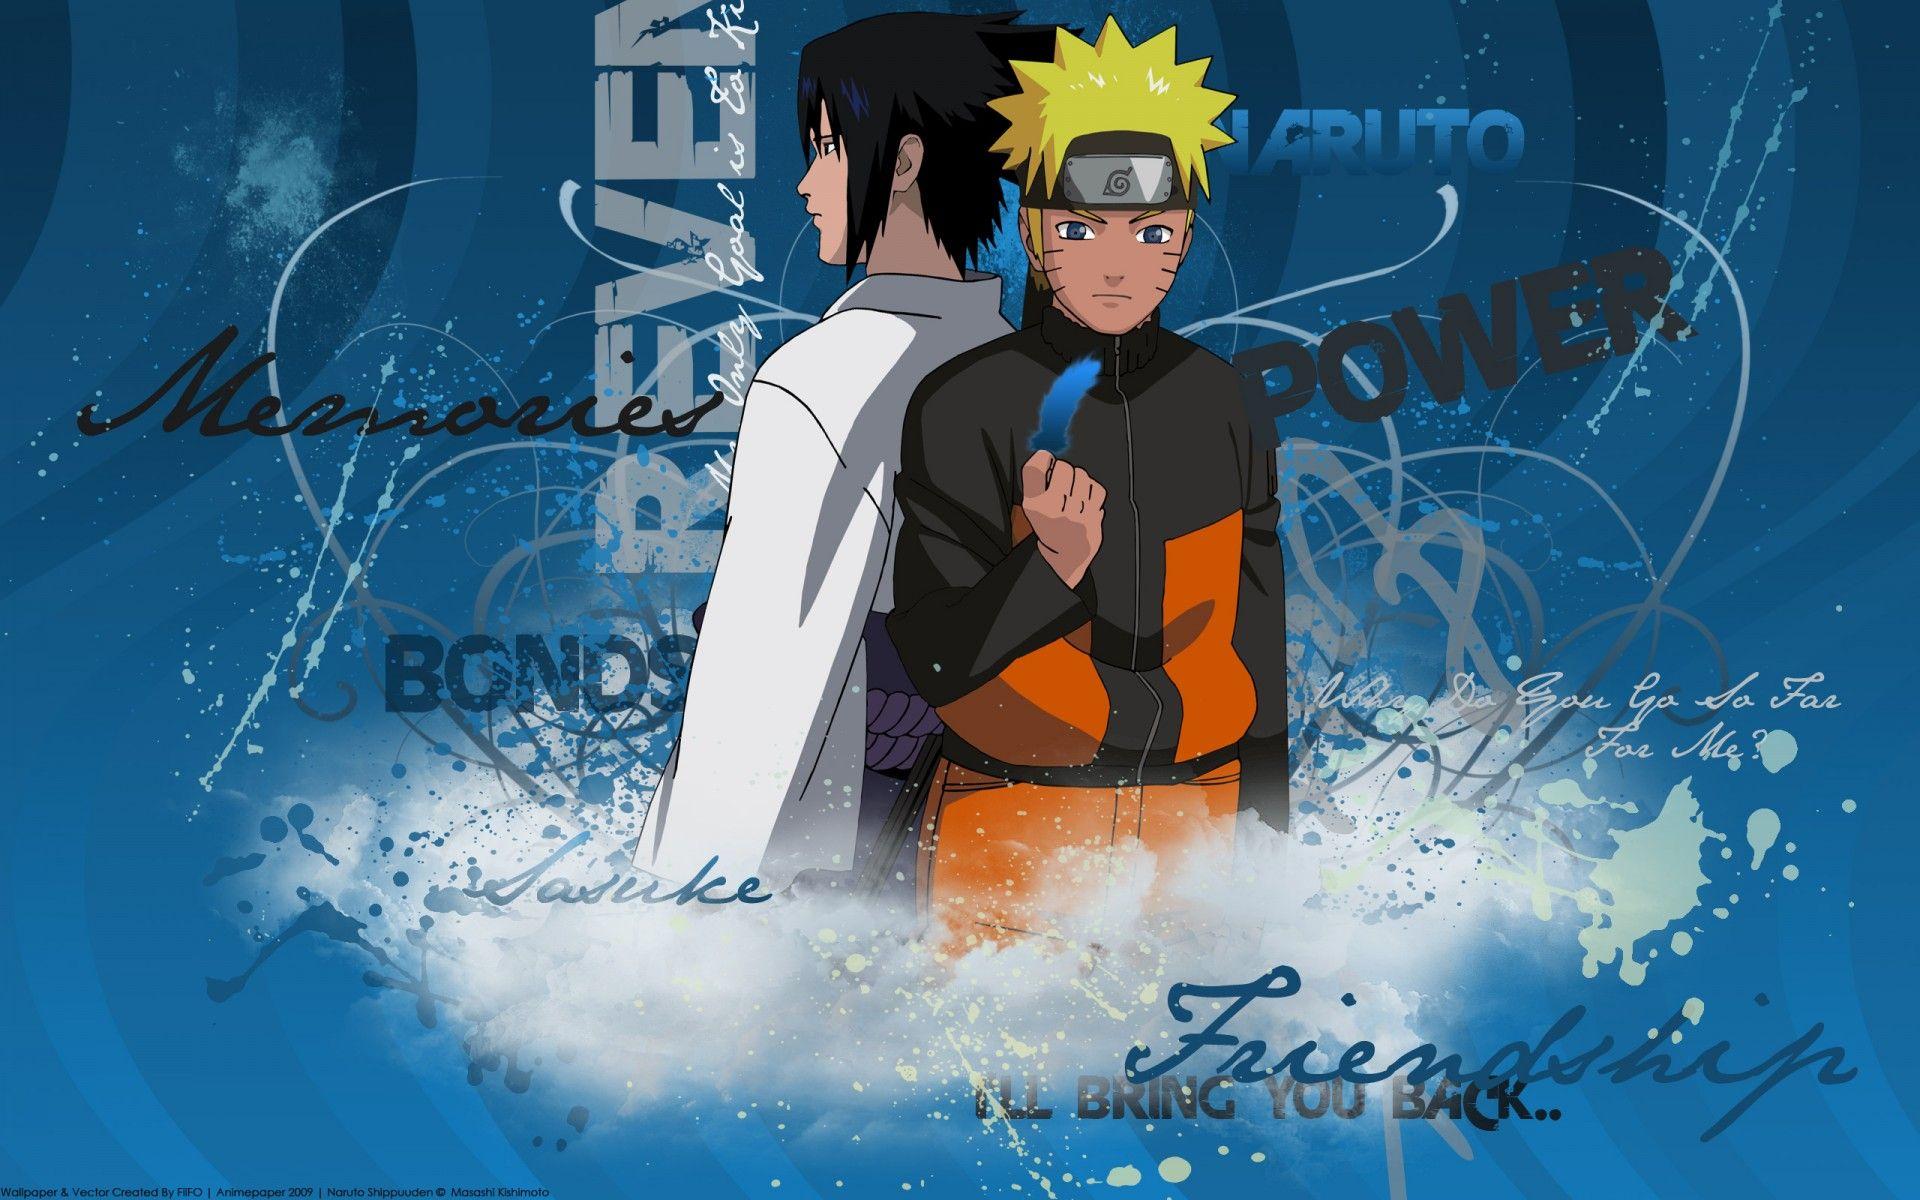 Simple Wallpaper Naruto Blue - a0ce9280219156ccab73329db85aa446  Image_77641.jpg